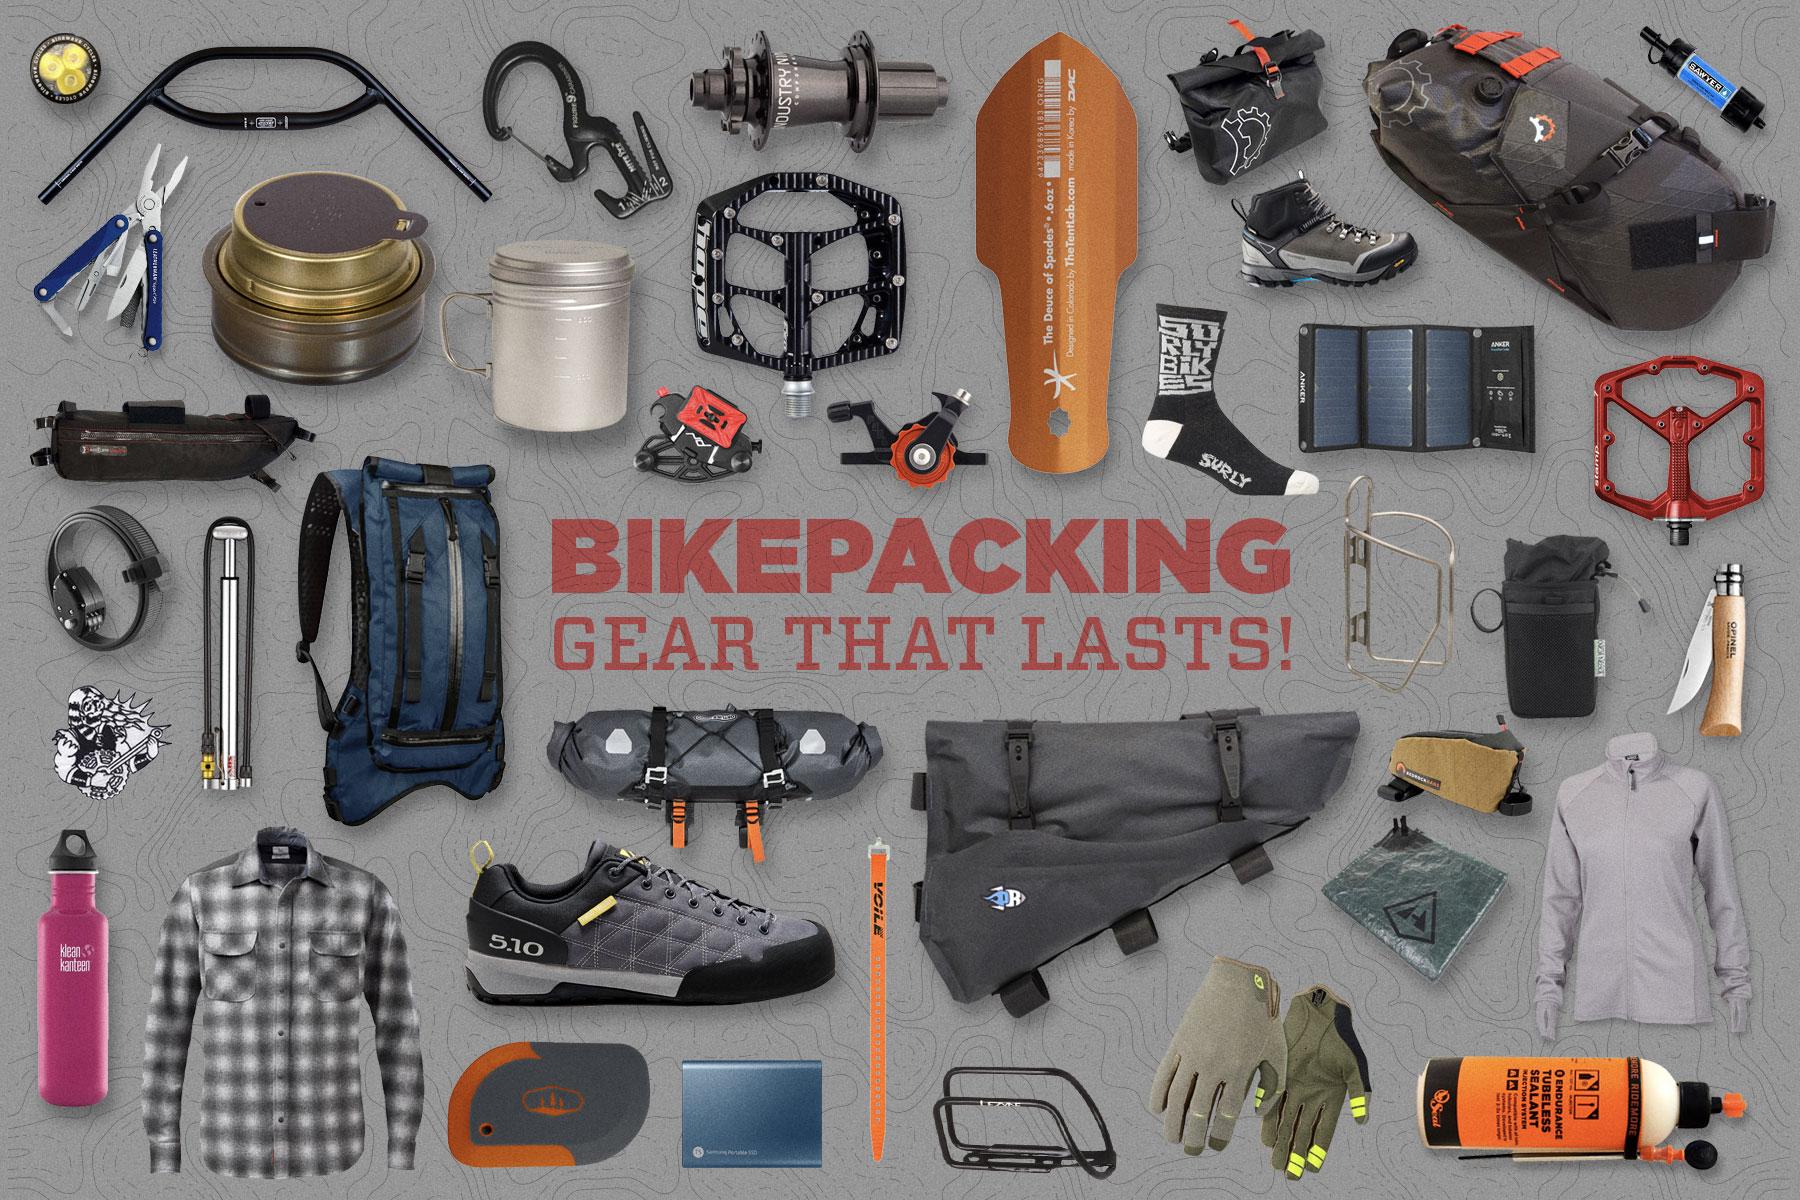 bikepackling-gear-that-lasts-1